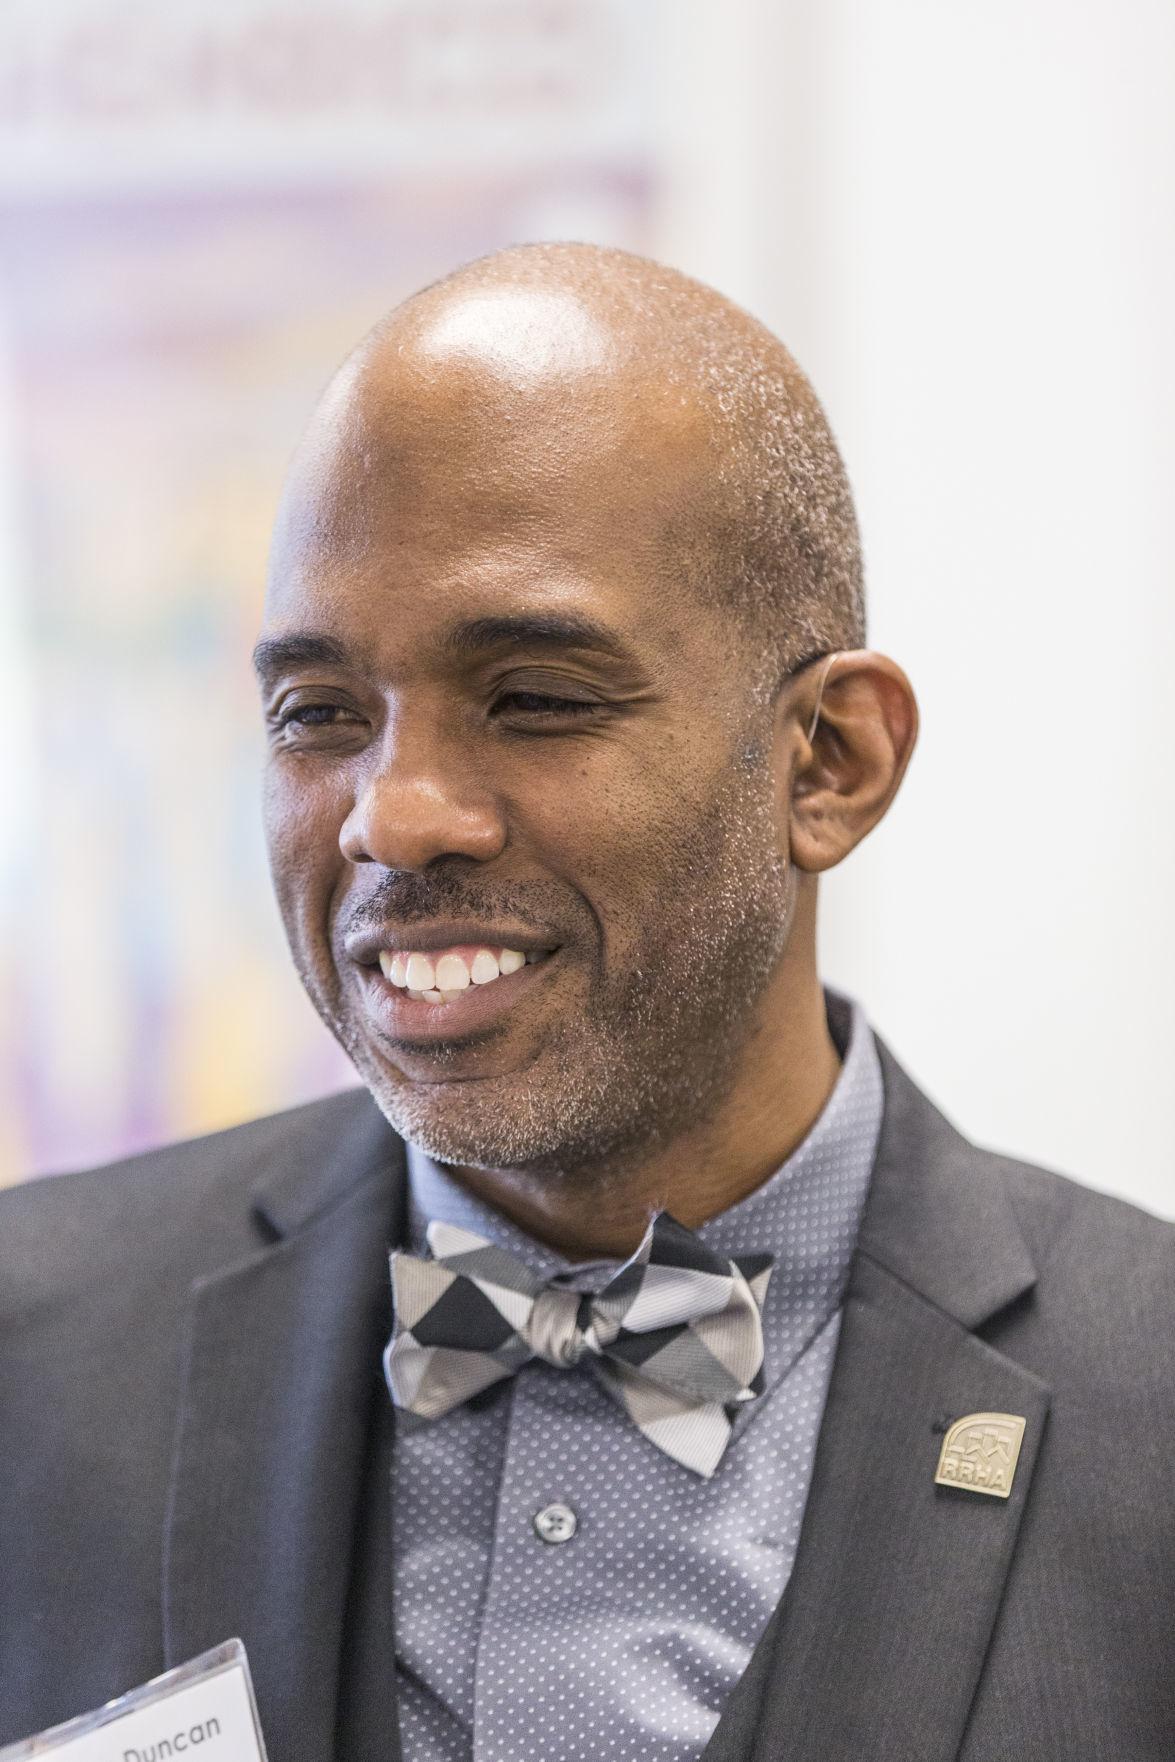 Damon Duncan, the new executive director of RRHA